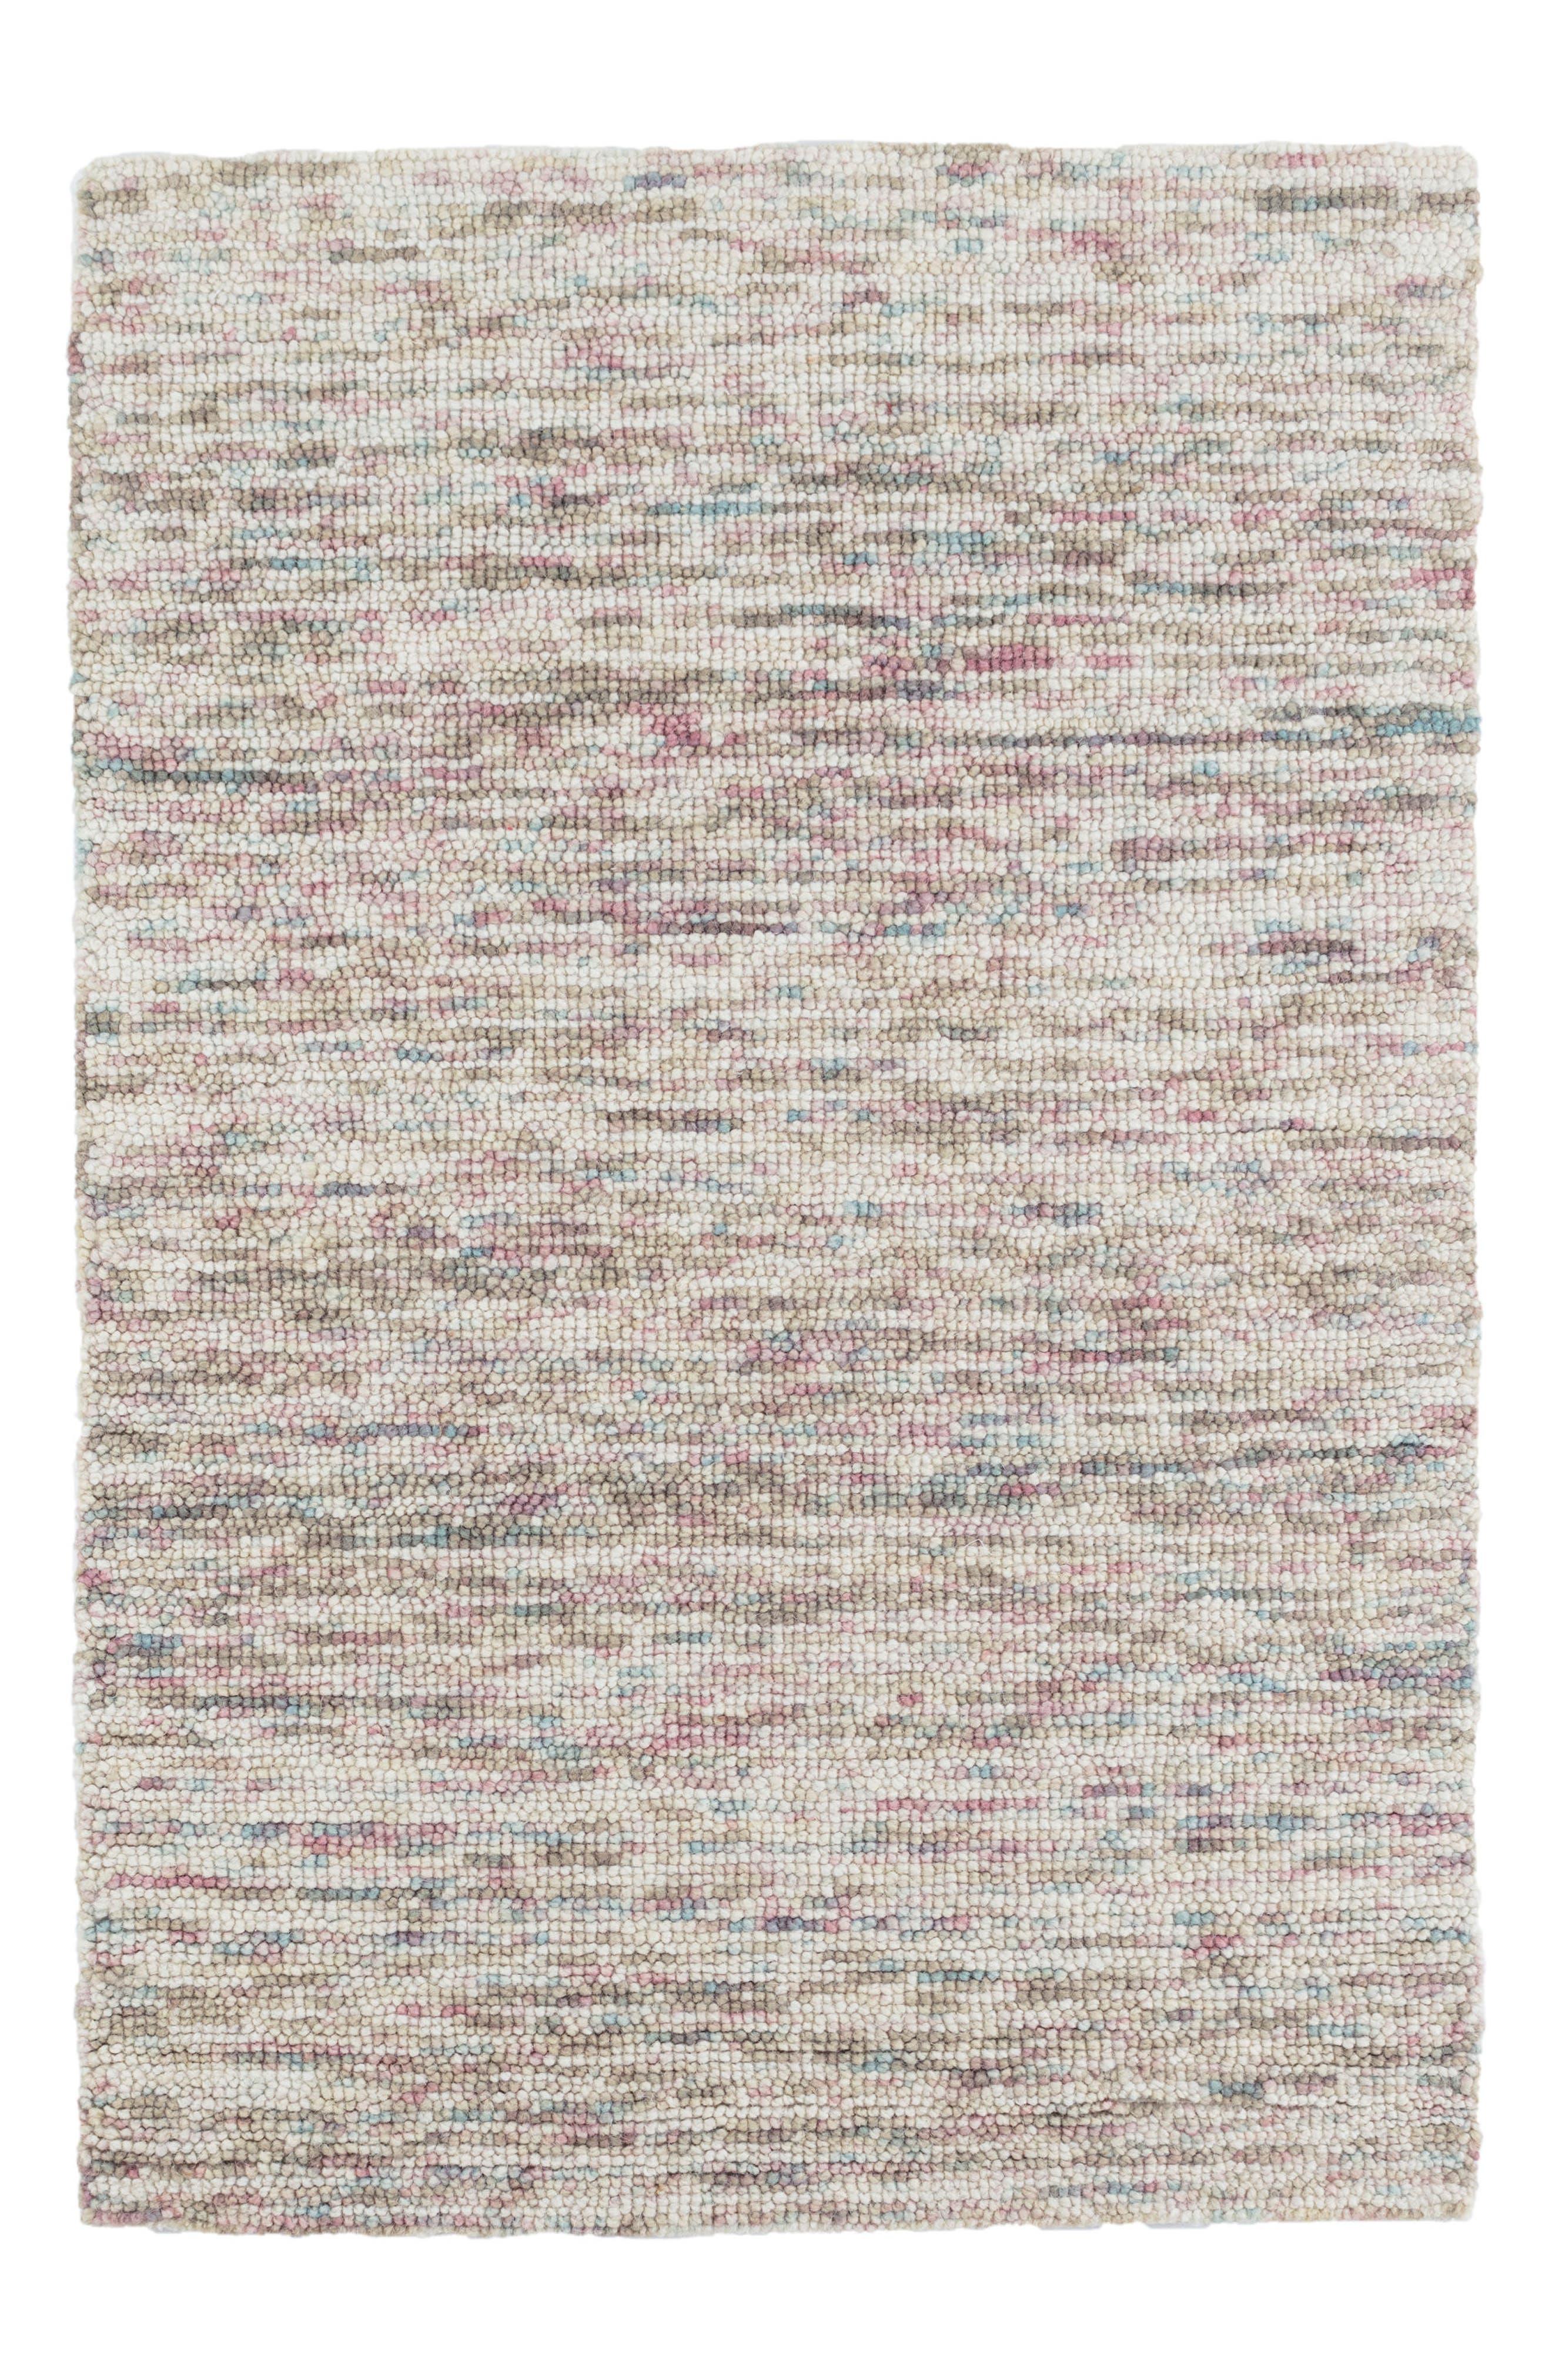 Artisanal Hooked Wool Rug,                             Main thumbnail 1, color,                             400